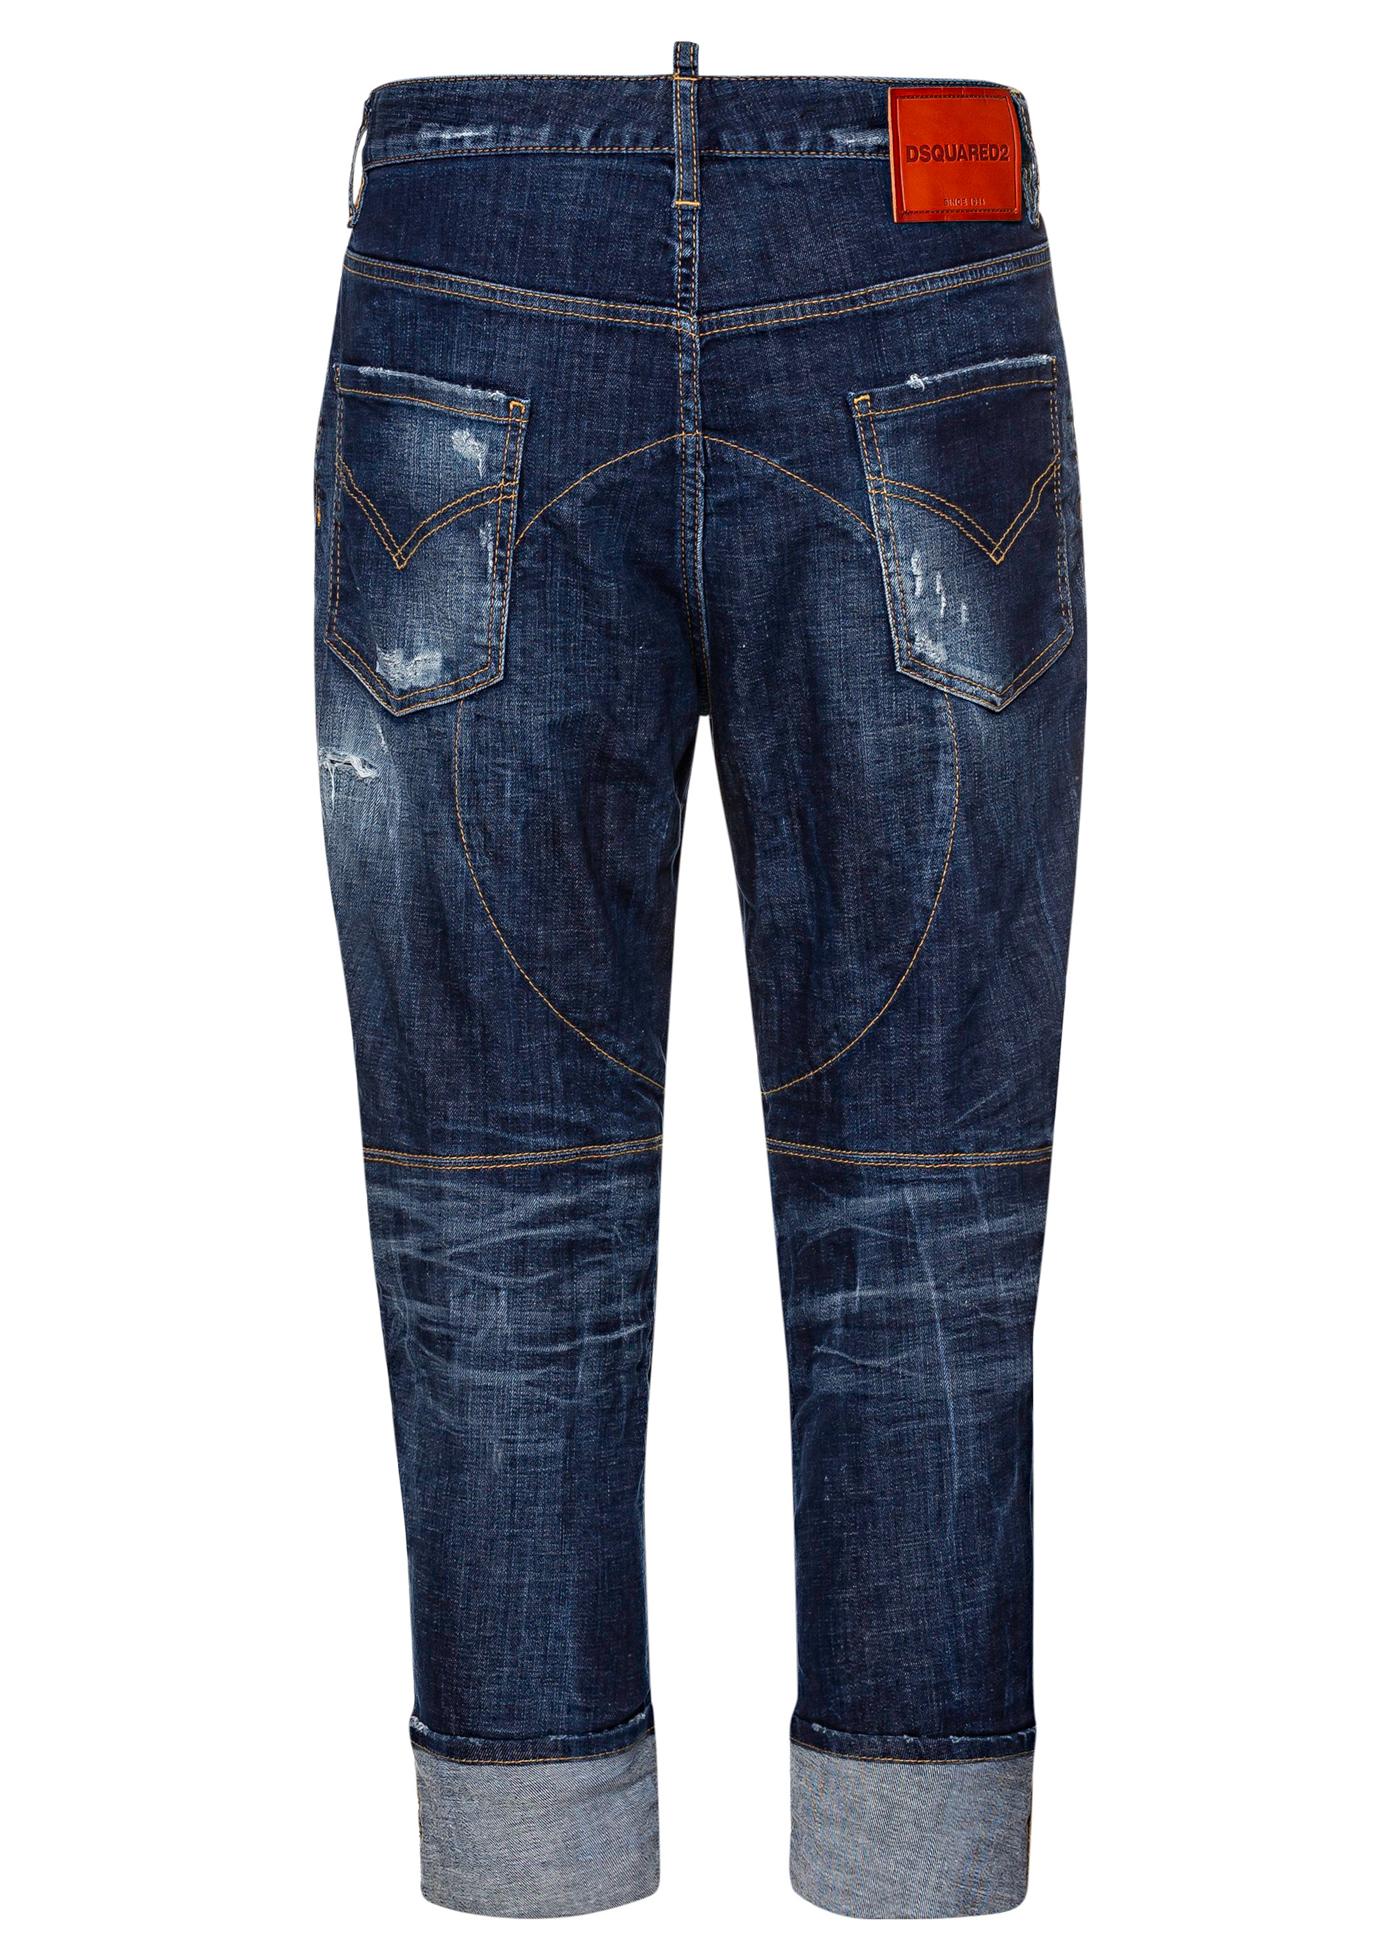 Combat Jeans image number 1